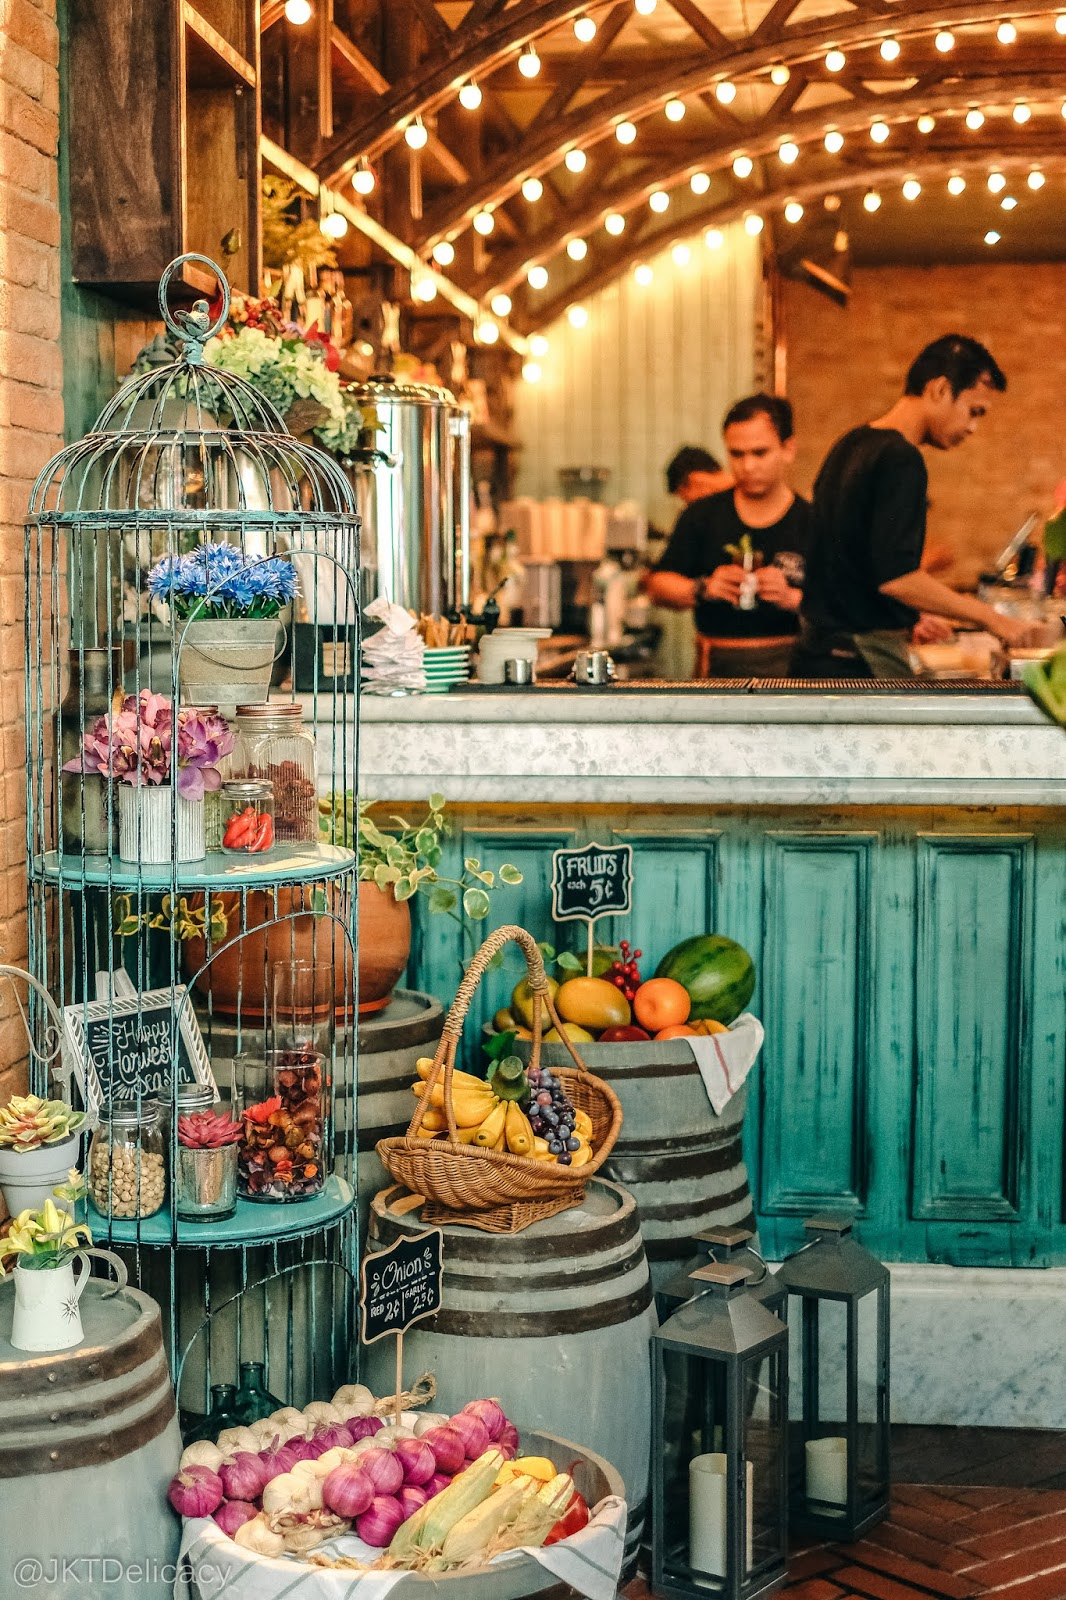 Jktdelicacy Com The Garden Beautiful Garden Theme Cafe At Pik